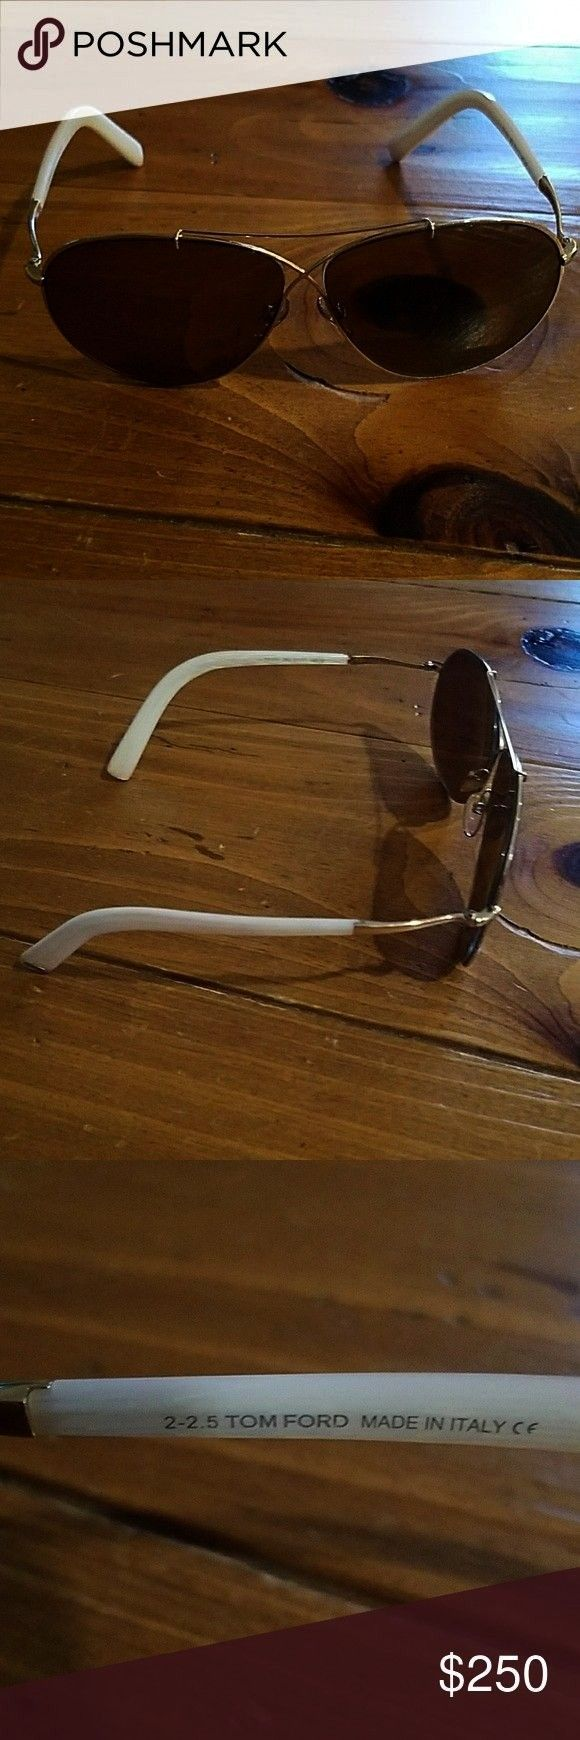 offer!! Authentic Tom Ford Sunglasses Aviator Sunglasses with Original Case Accessories SunglassesM